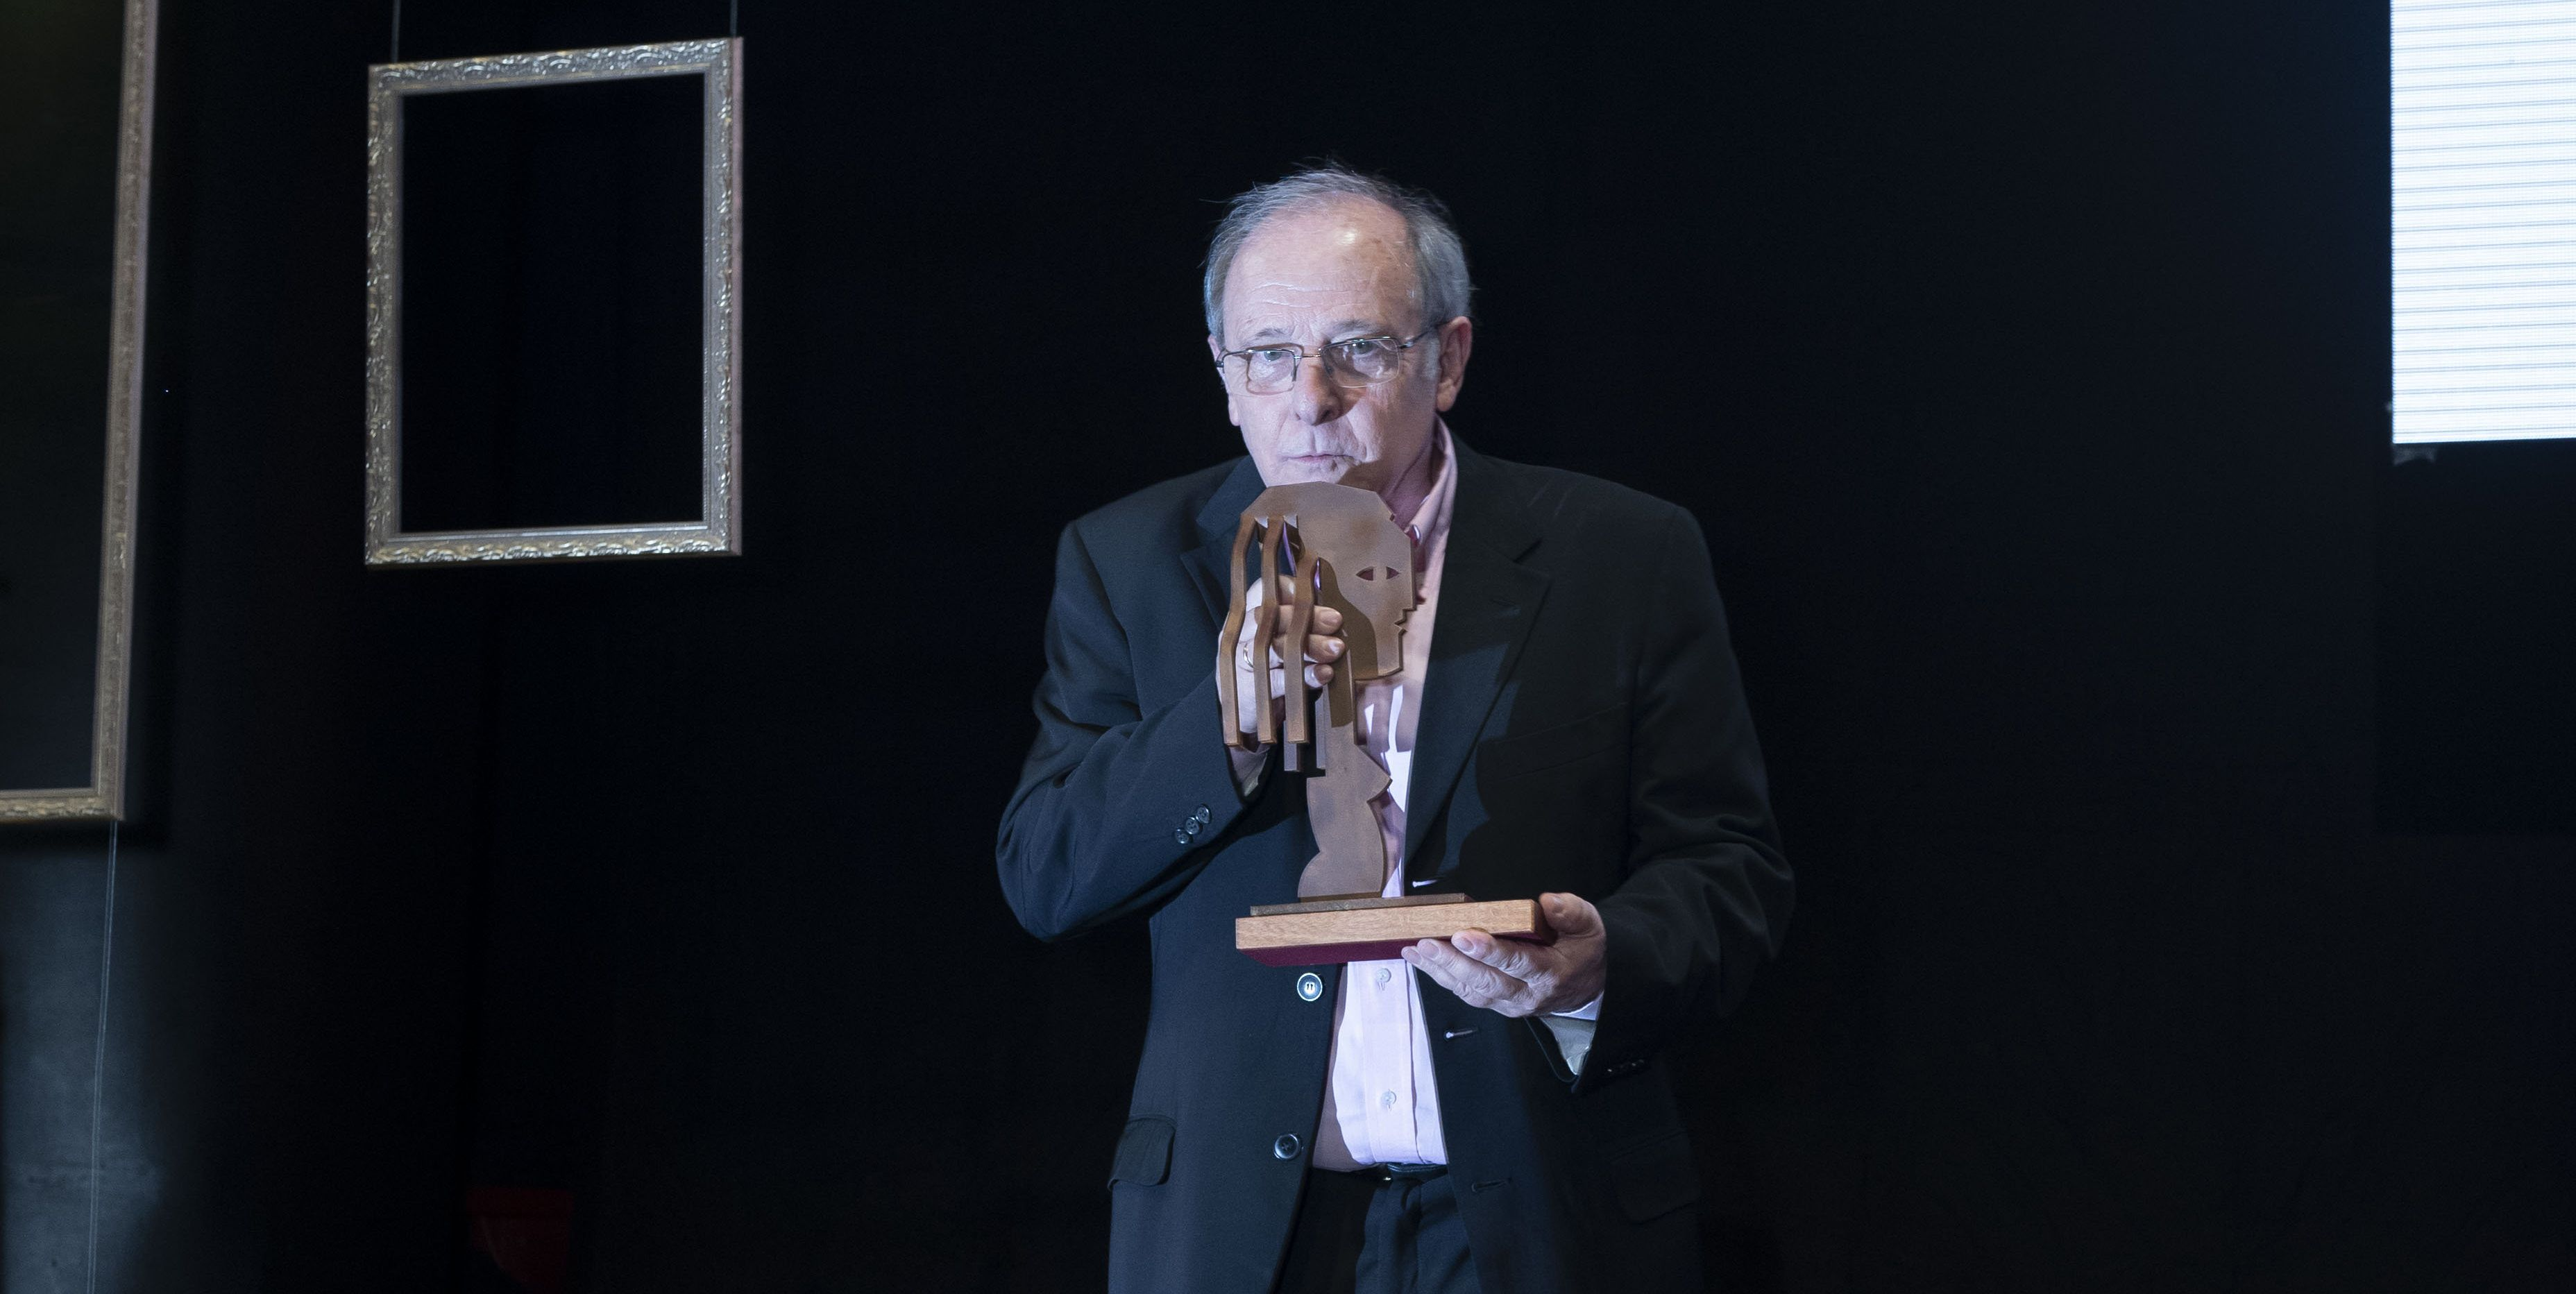 emilio gutierrez caba fotogramas de plata de honor